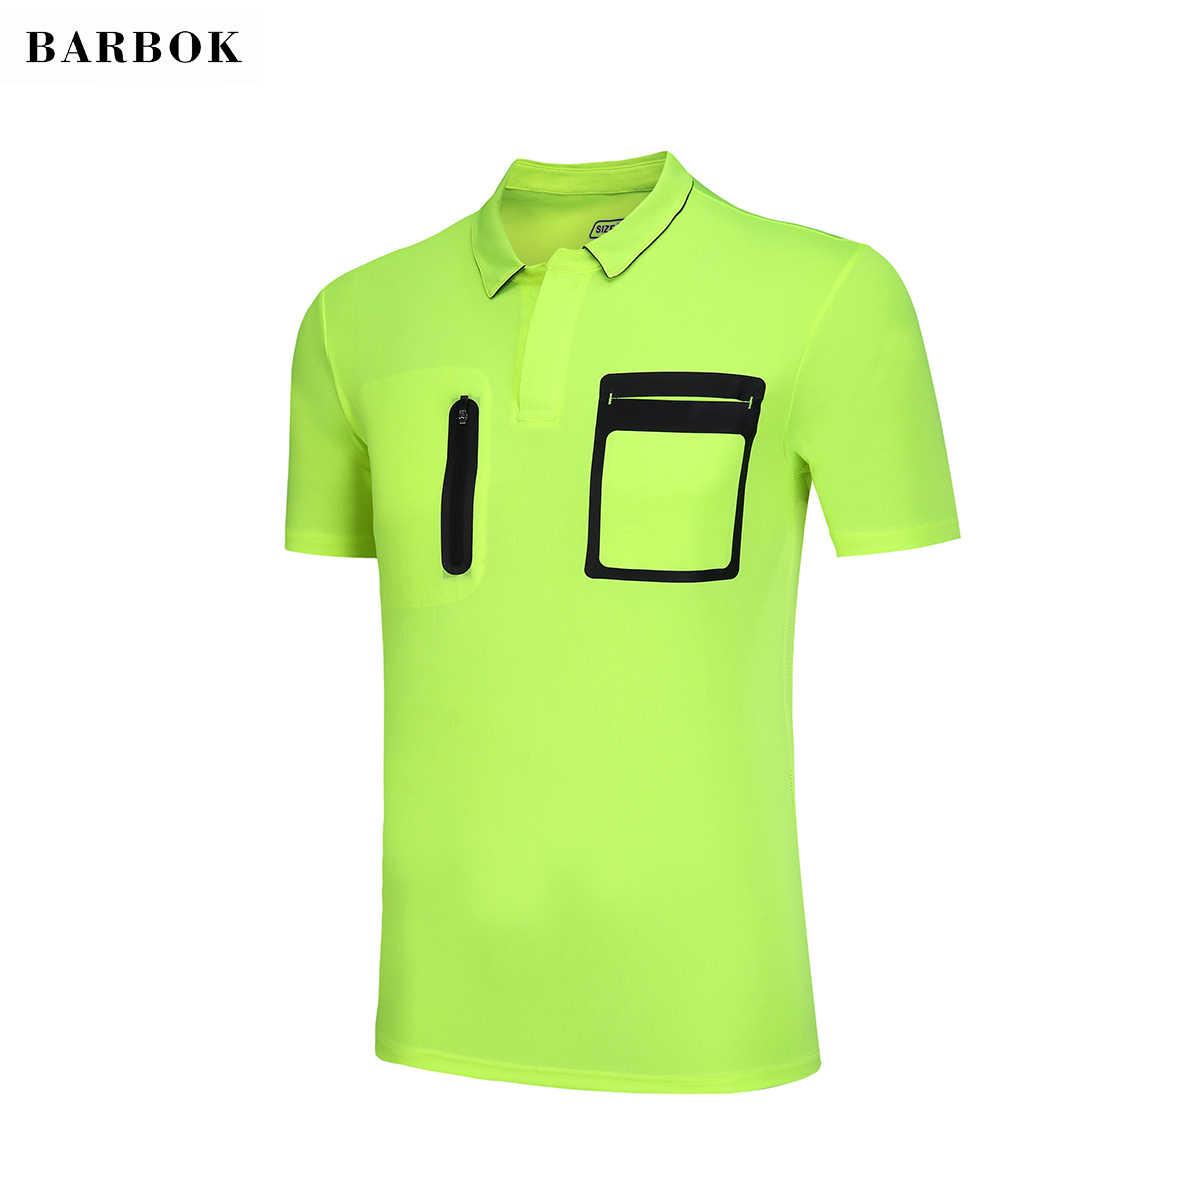 BARBOK Referee Shirt Men s Gym Fitness T-shirt Quick Dry Short Sleeve  Running Soccer Football 29b9ac9dc